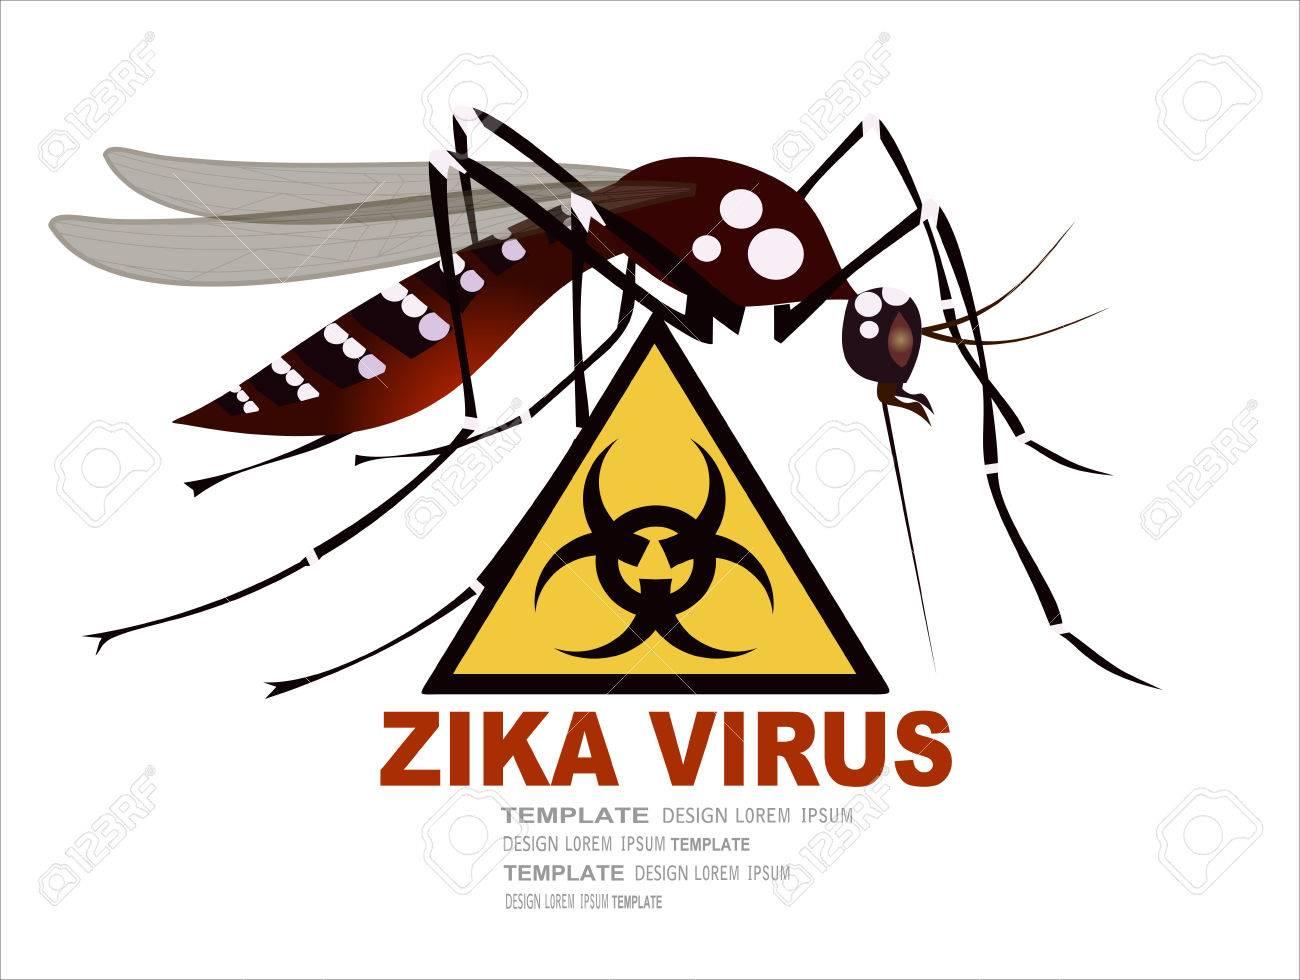 Zika virus warning sign, vector - 52780764